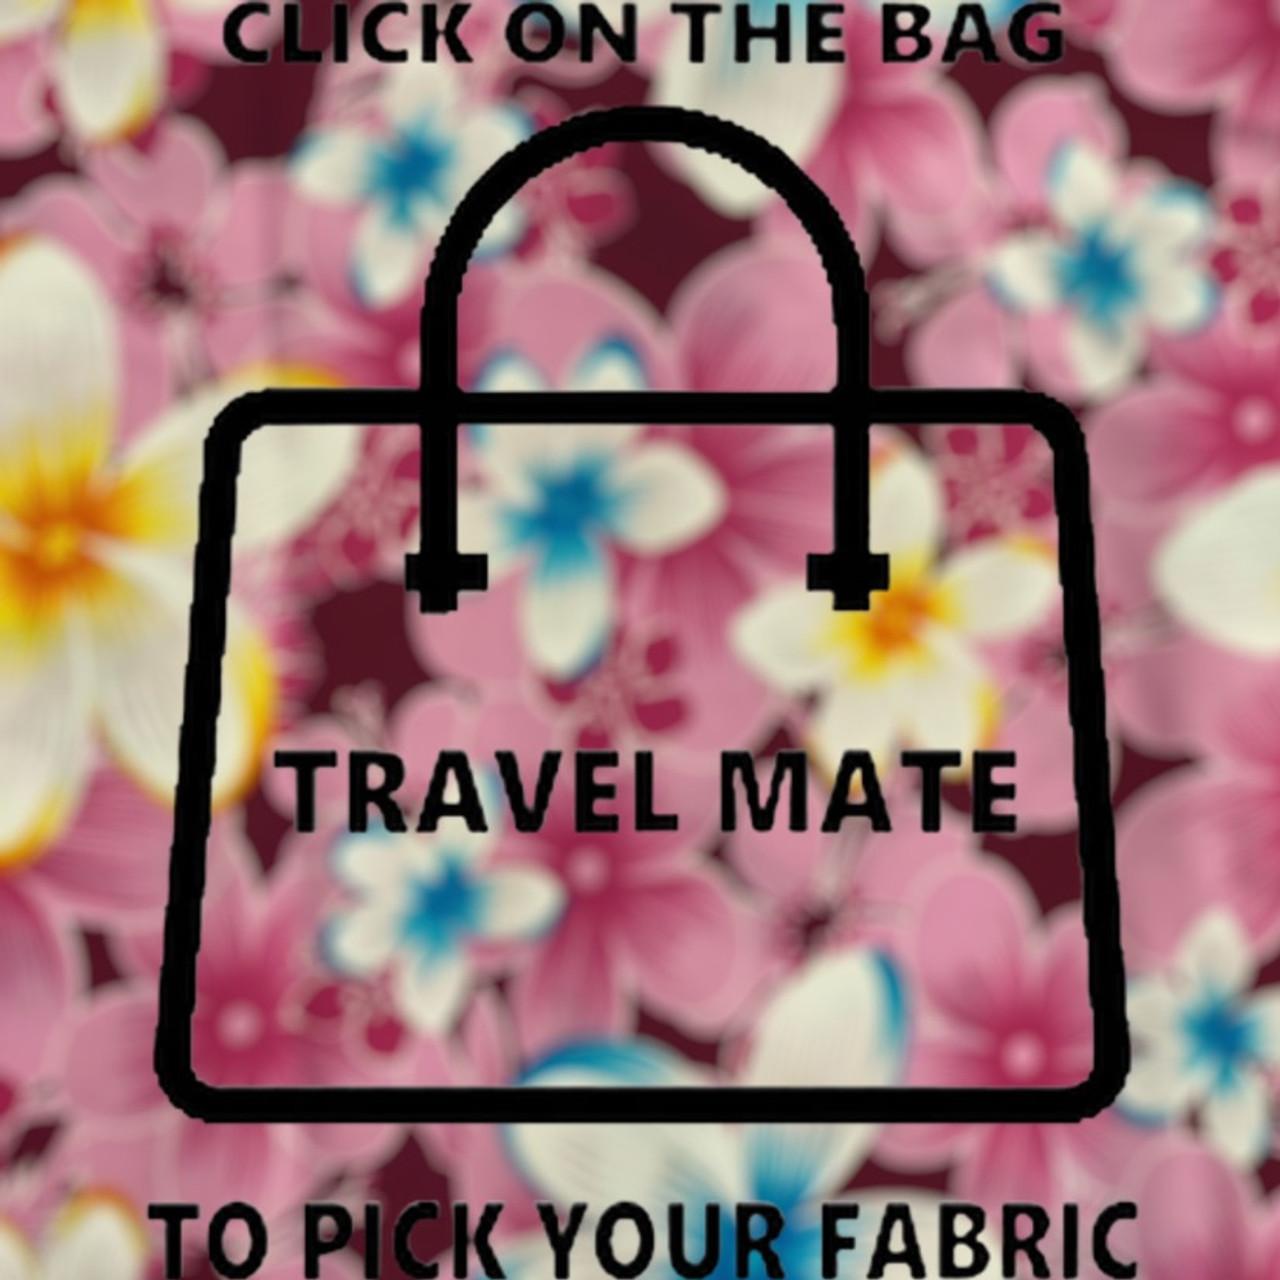 Travel Mate Bag  Fabric/PVC   52cmL X 28cmW X 25cm H Australian Made pvc gear bags